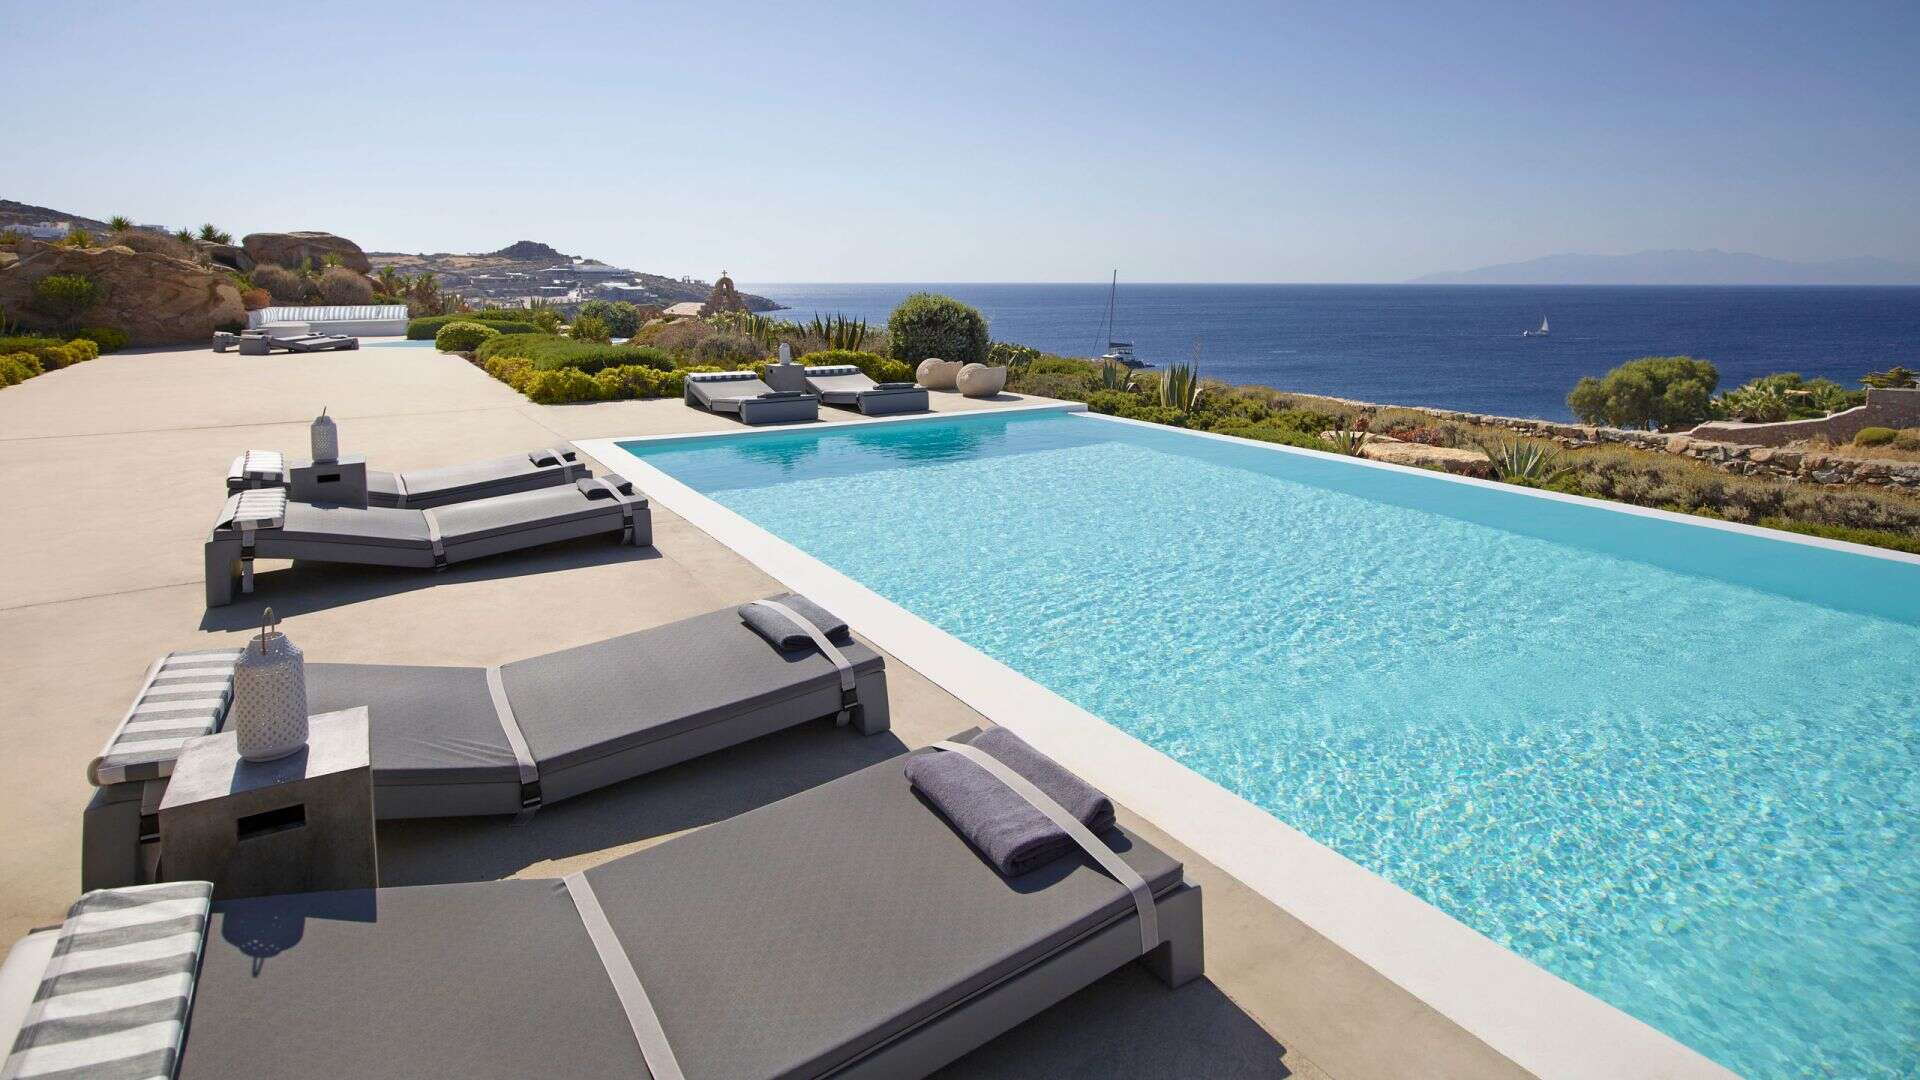 Luxury vacation rentals europe - Greece - Mykonos - Paranga - Talyssa - Image 1/17